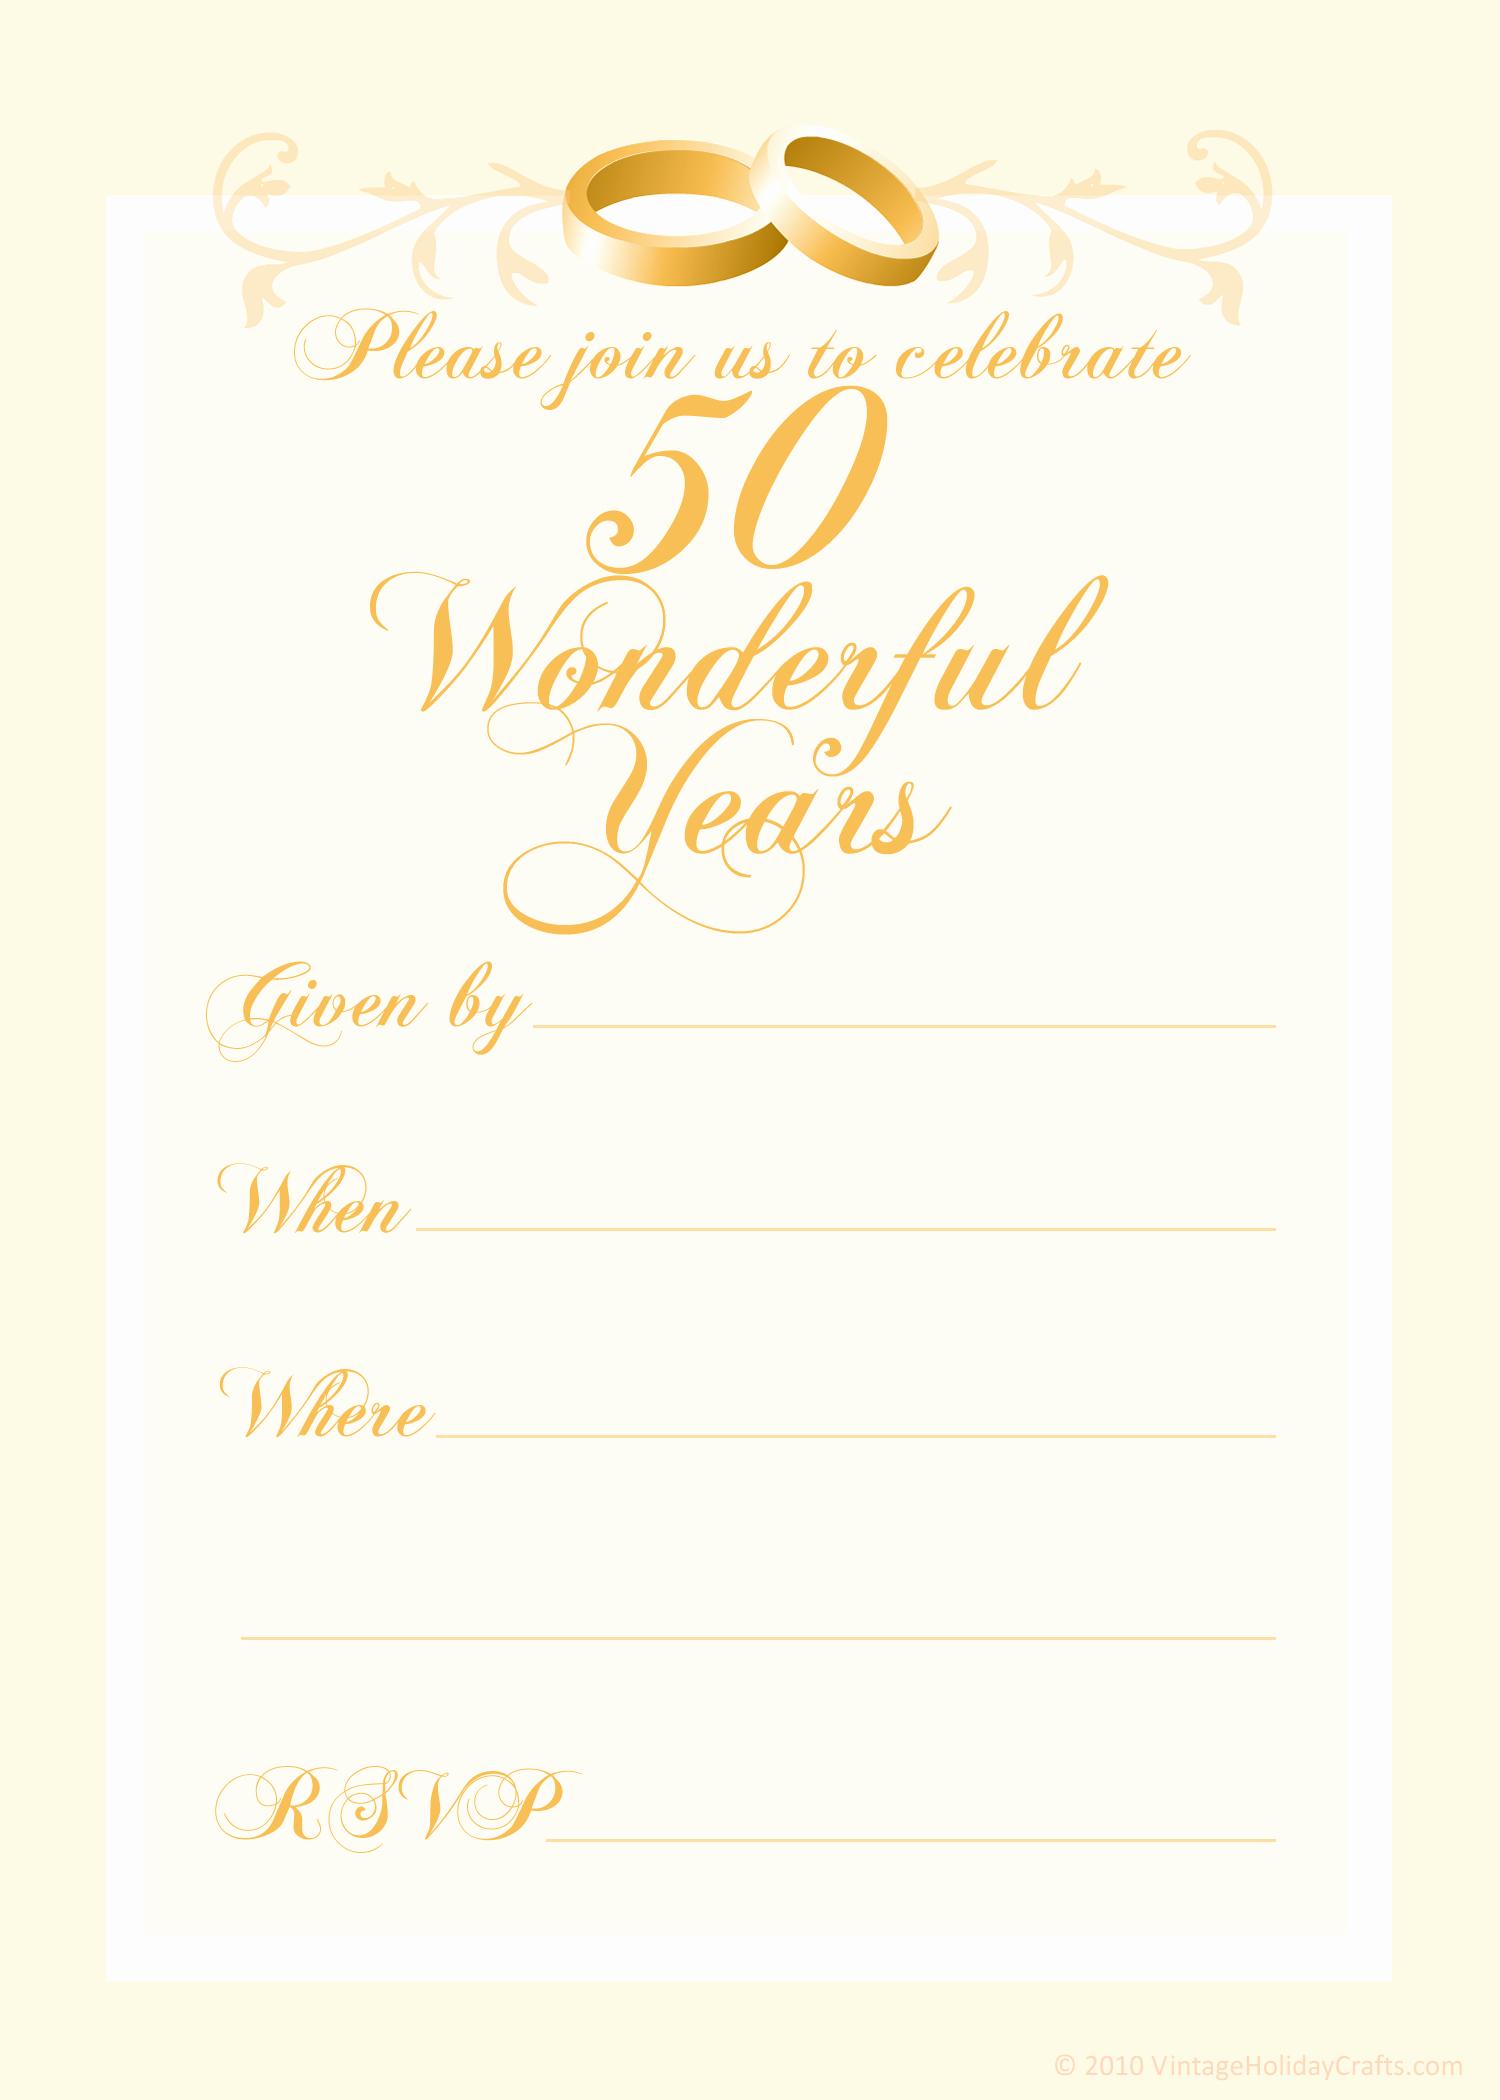 50th Wedding Anniversary Invitation Template Beautiful Free 50th Wedding Anniversary Invitations Templates